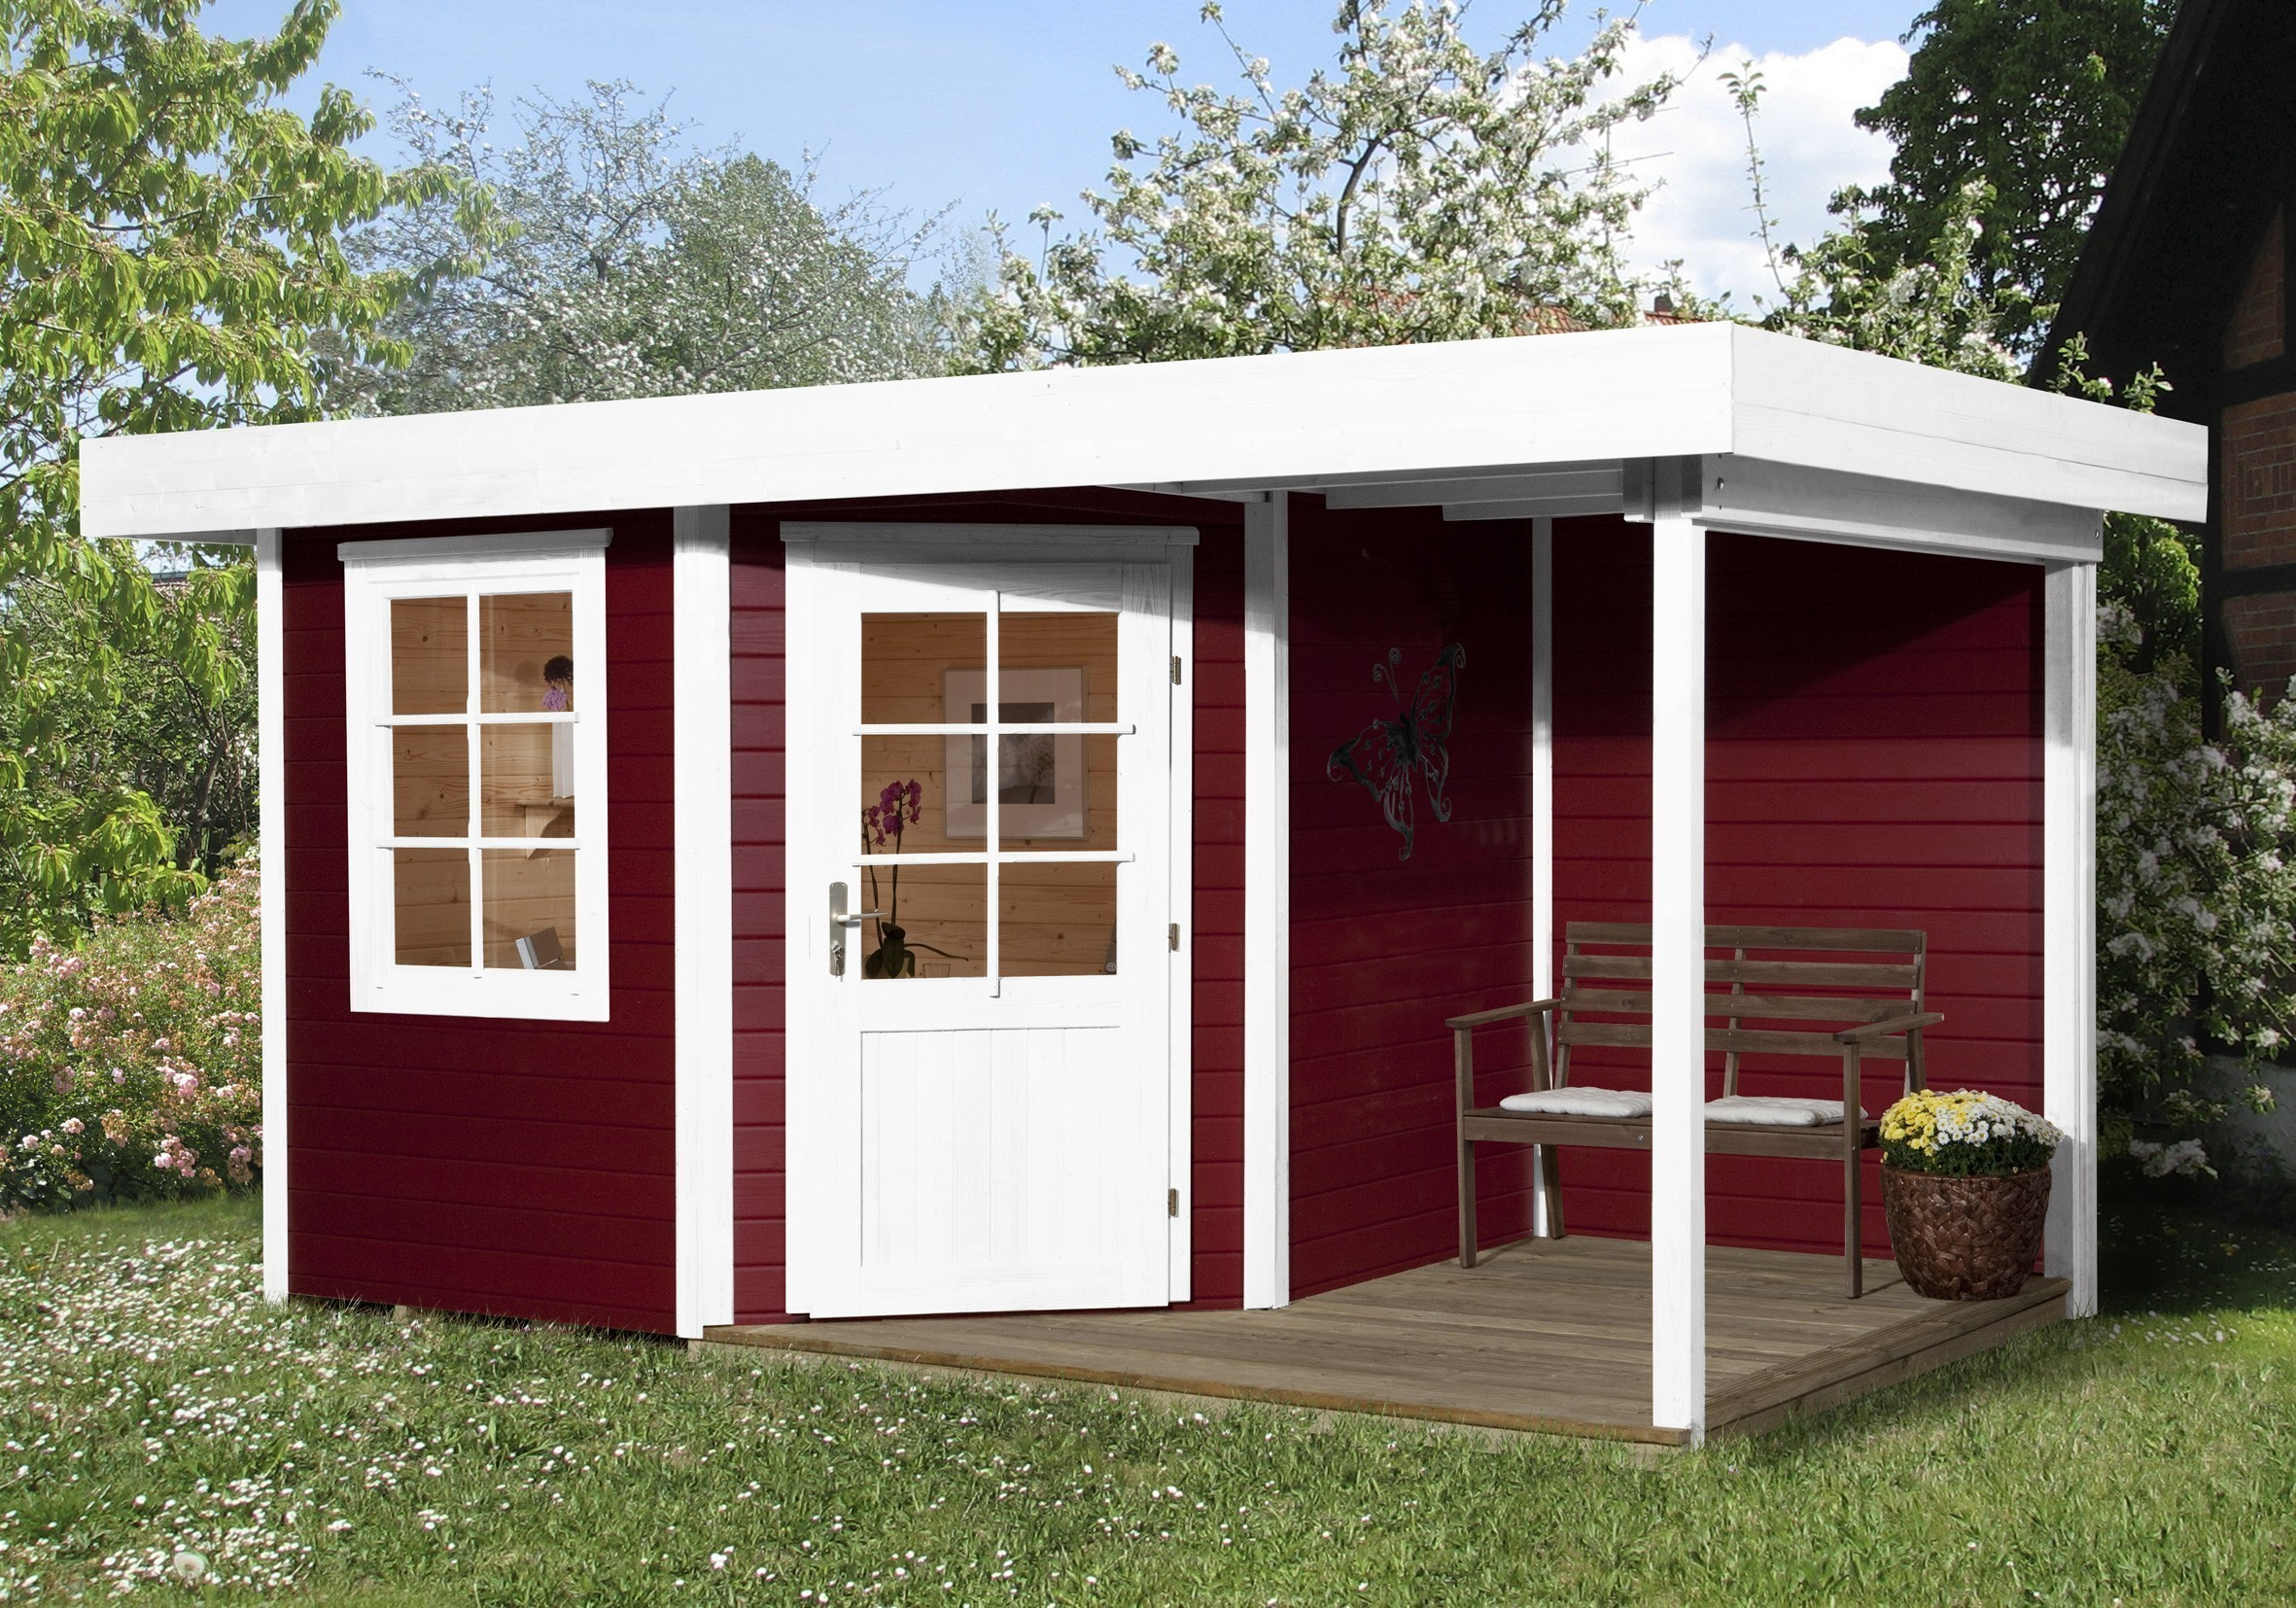 weka gartenhaus 28 mm designhaus 213a gr 1 anbau rot 442x278cm bei. Black Bedroom Furniture Sets. Home Design Ideas